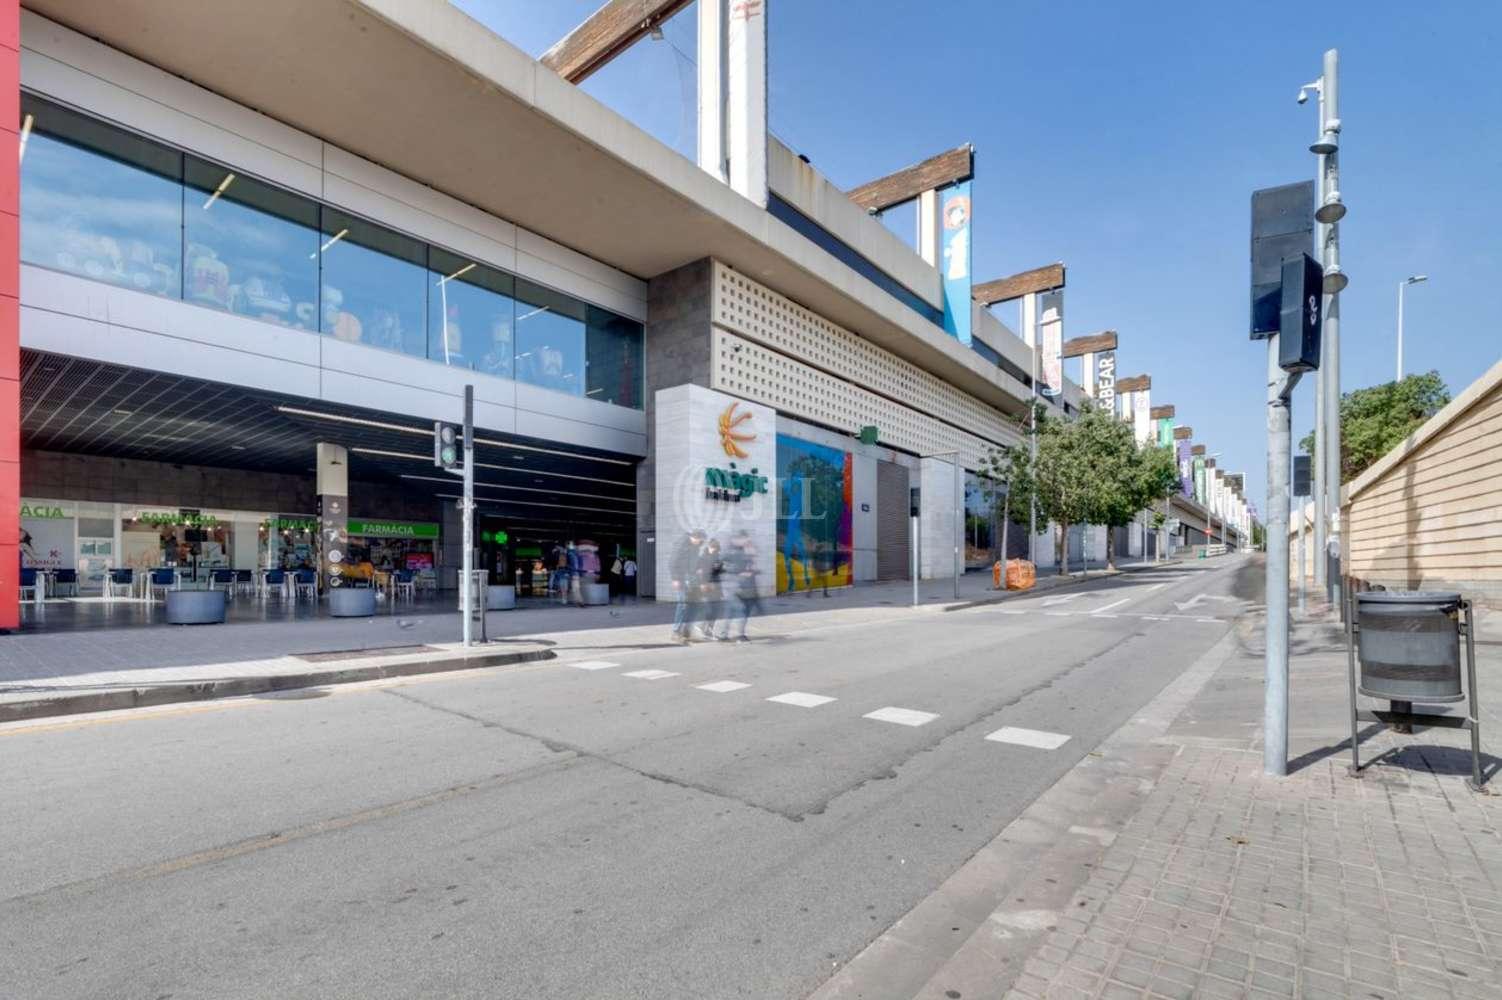 Local comercial Badalona, 08912 - local 1